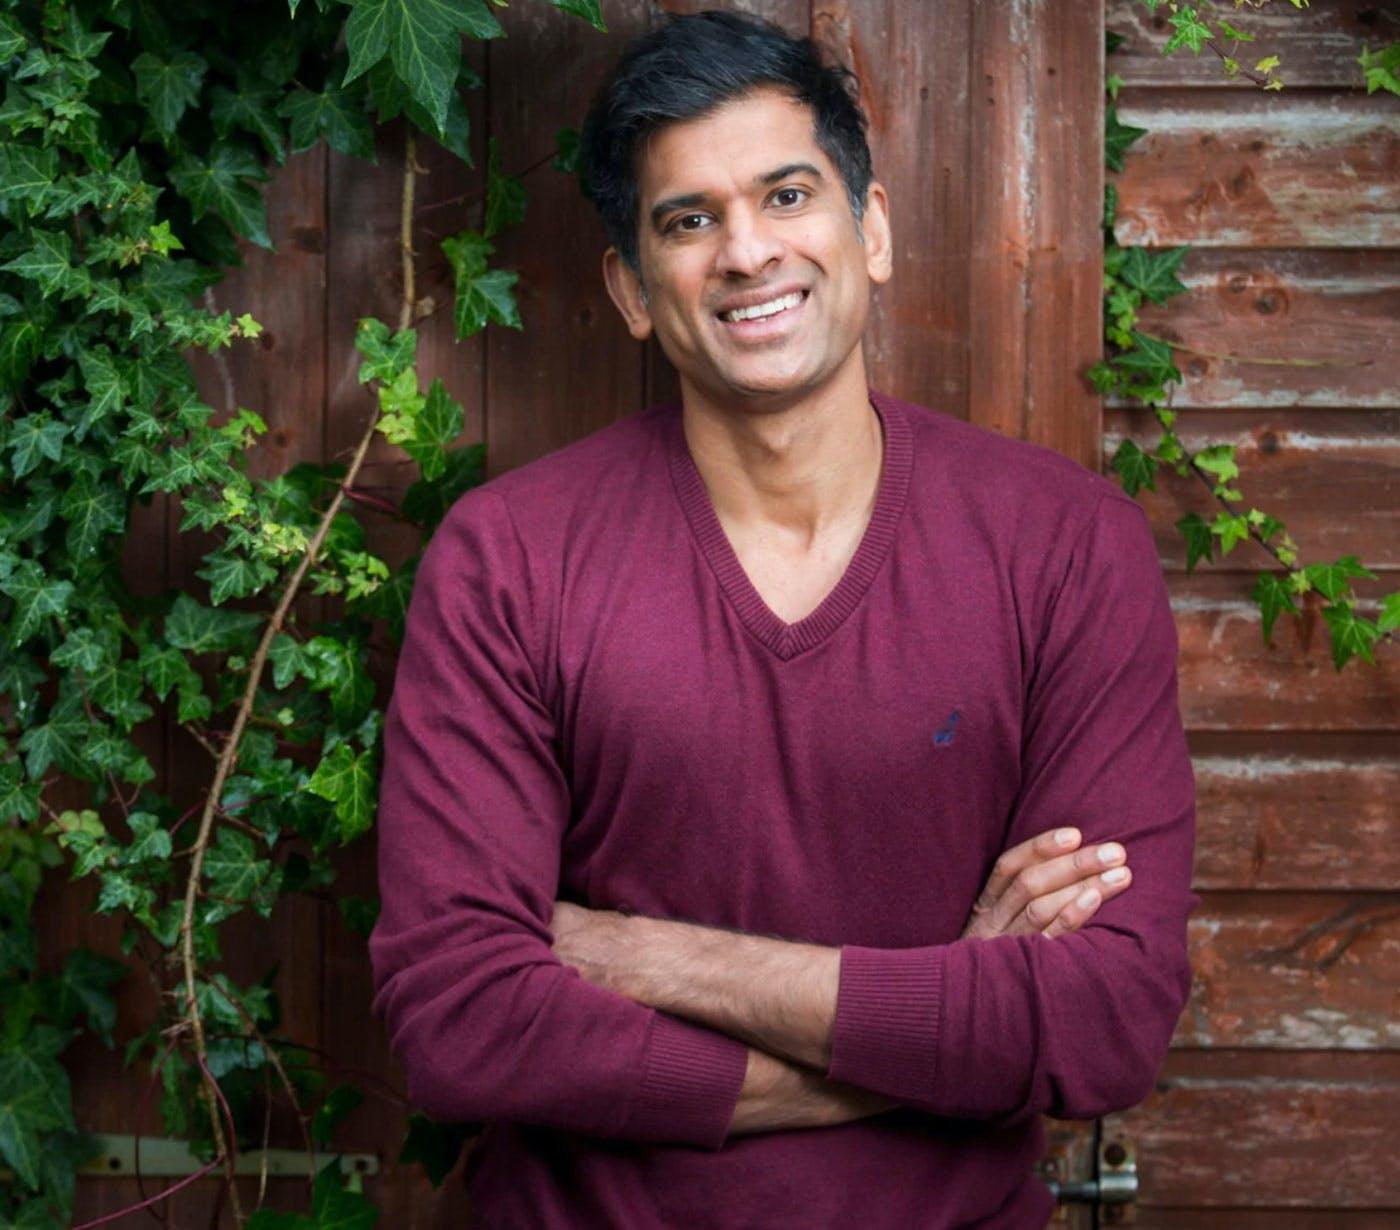 Dr. Rangan